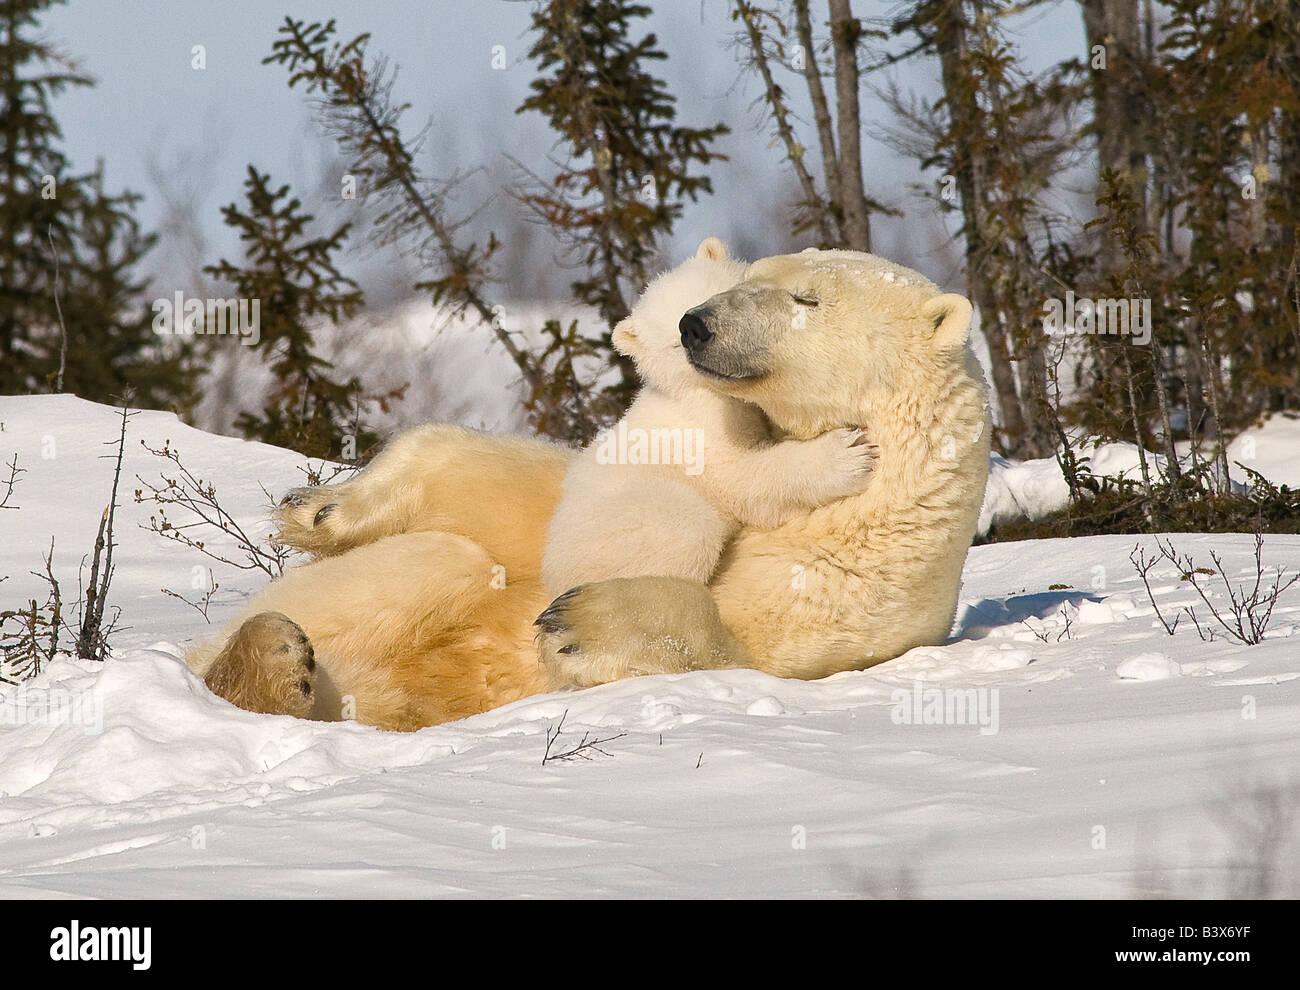 Eisbär (Ursus Maritimus) mit Jungtier Stockbild